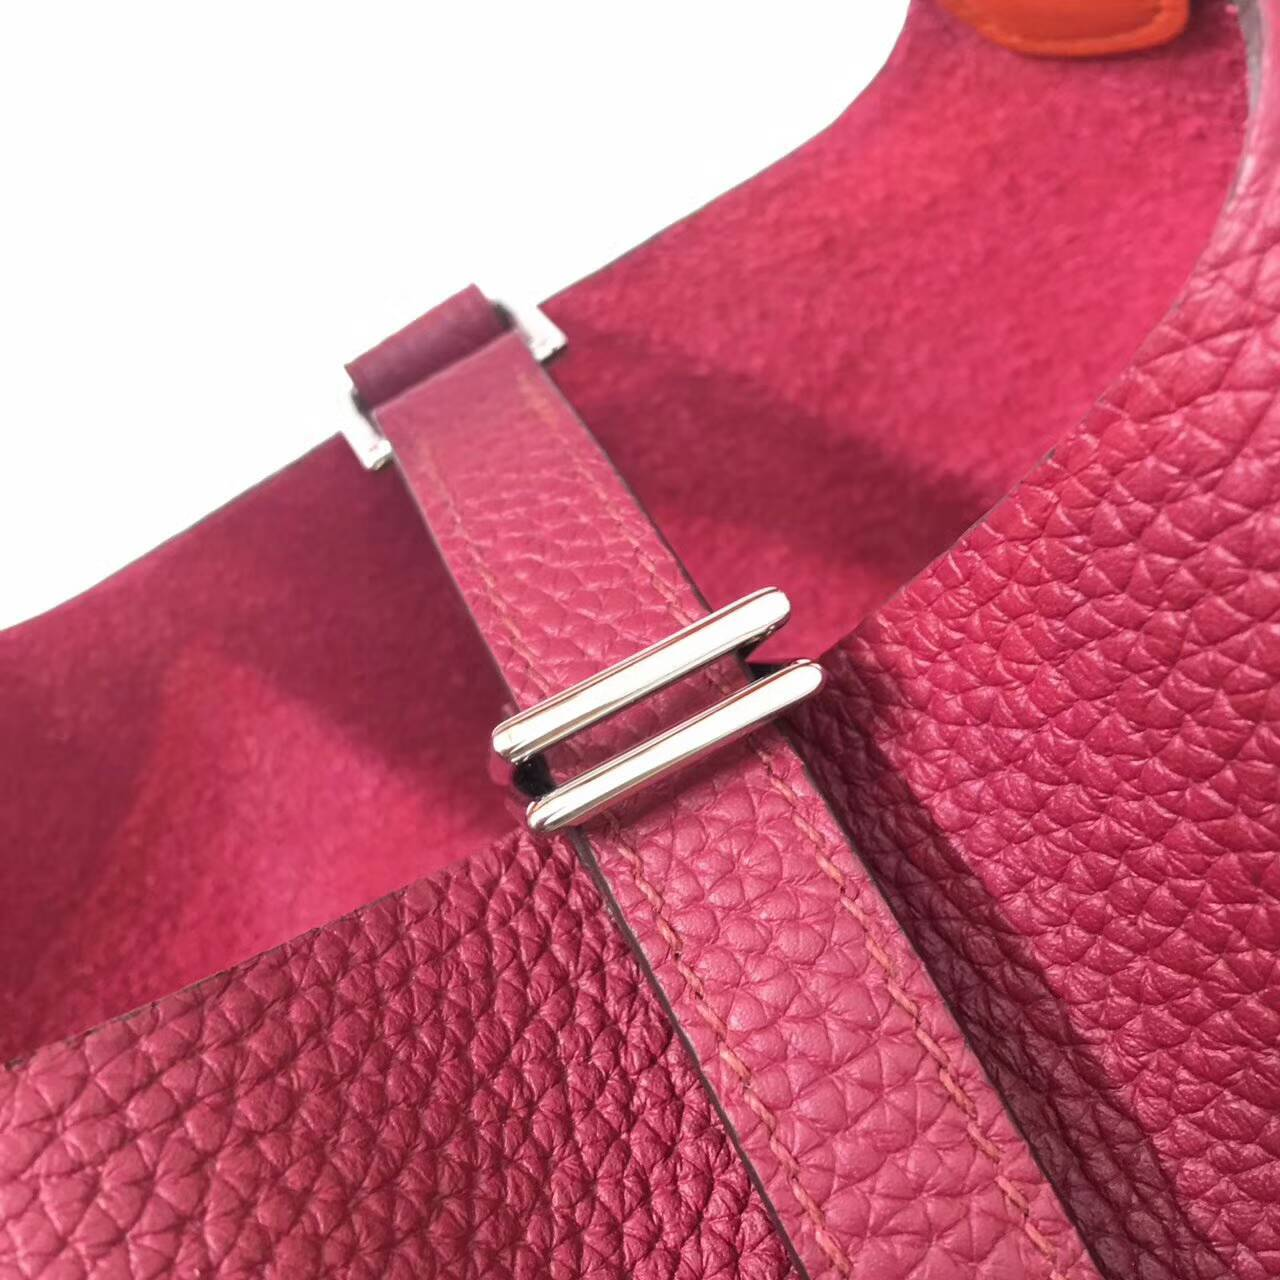 Hermes菜篮子 Picotin Lock 18cm Clemence 法国原产Tc皮 B5 Rubis 宝石红拼9J Feu火焰橙 银扣